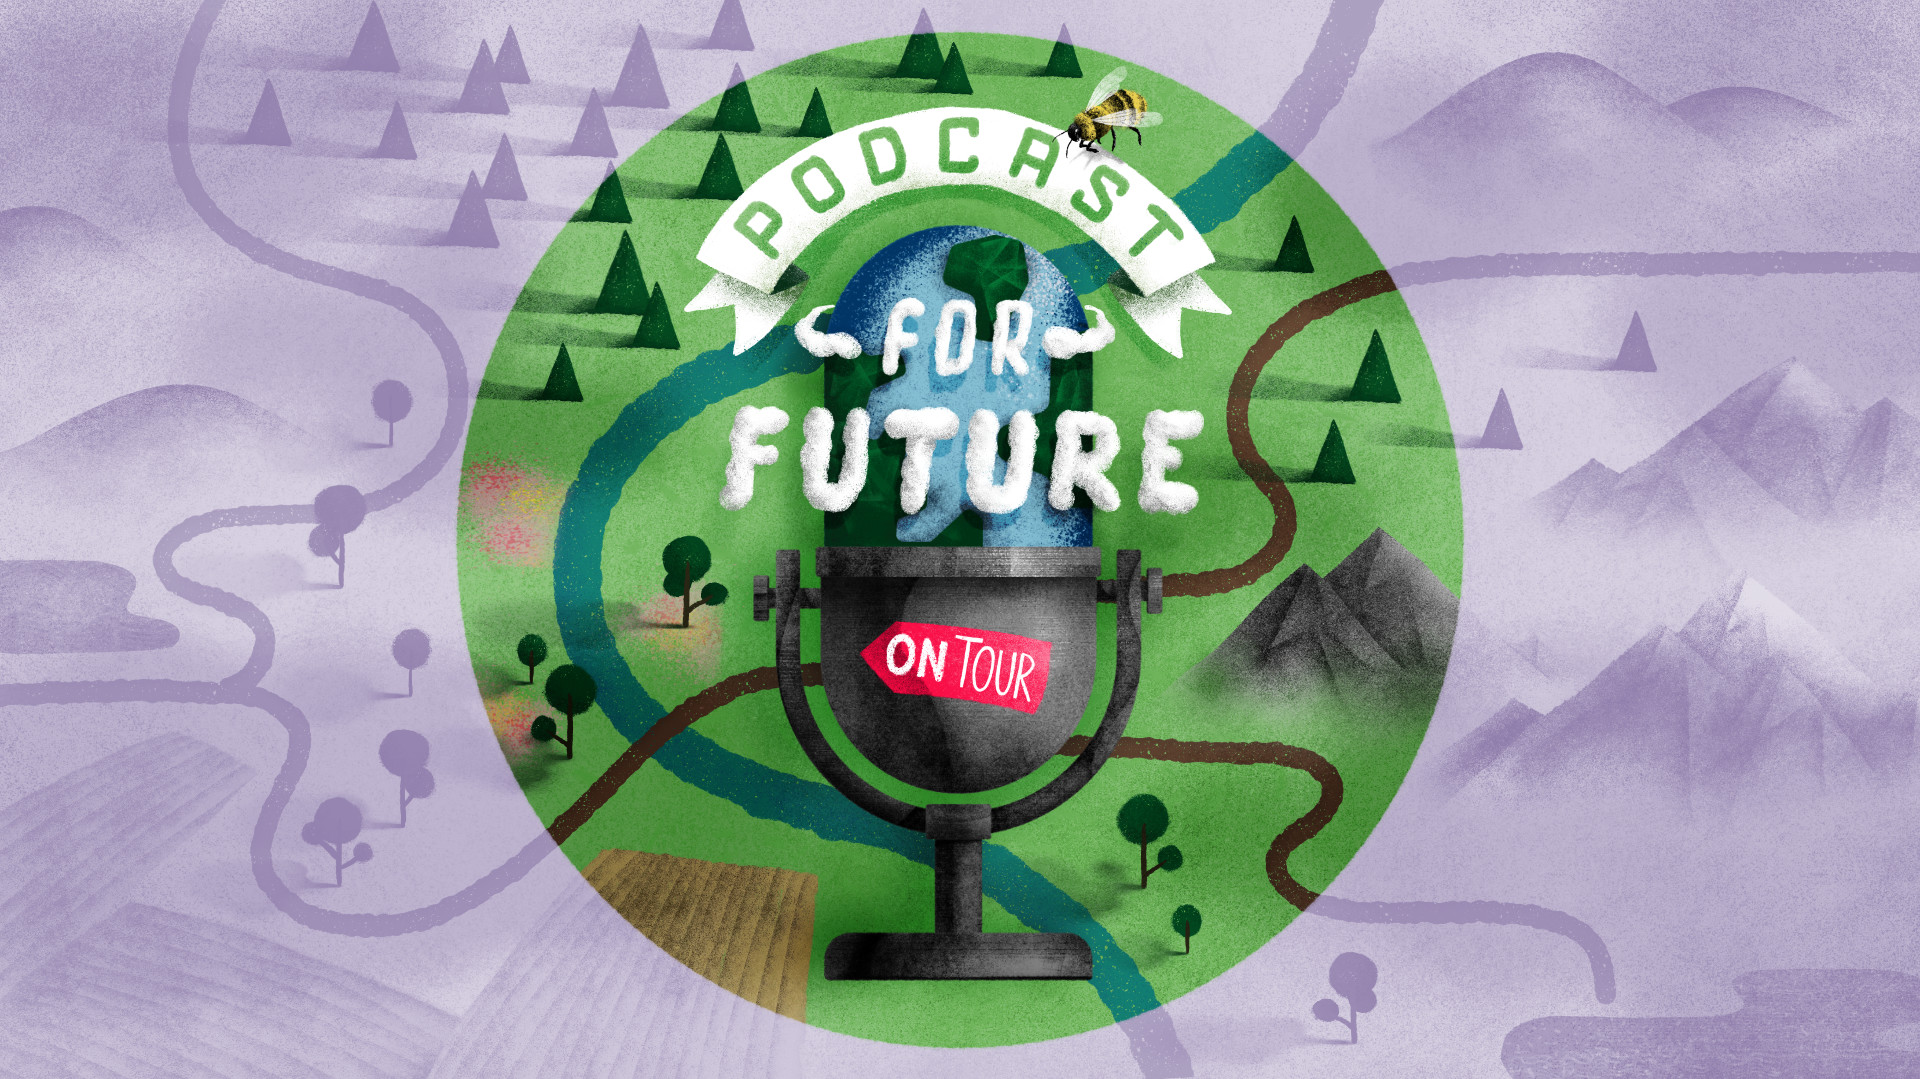 Podcast fo Future on tour